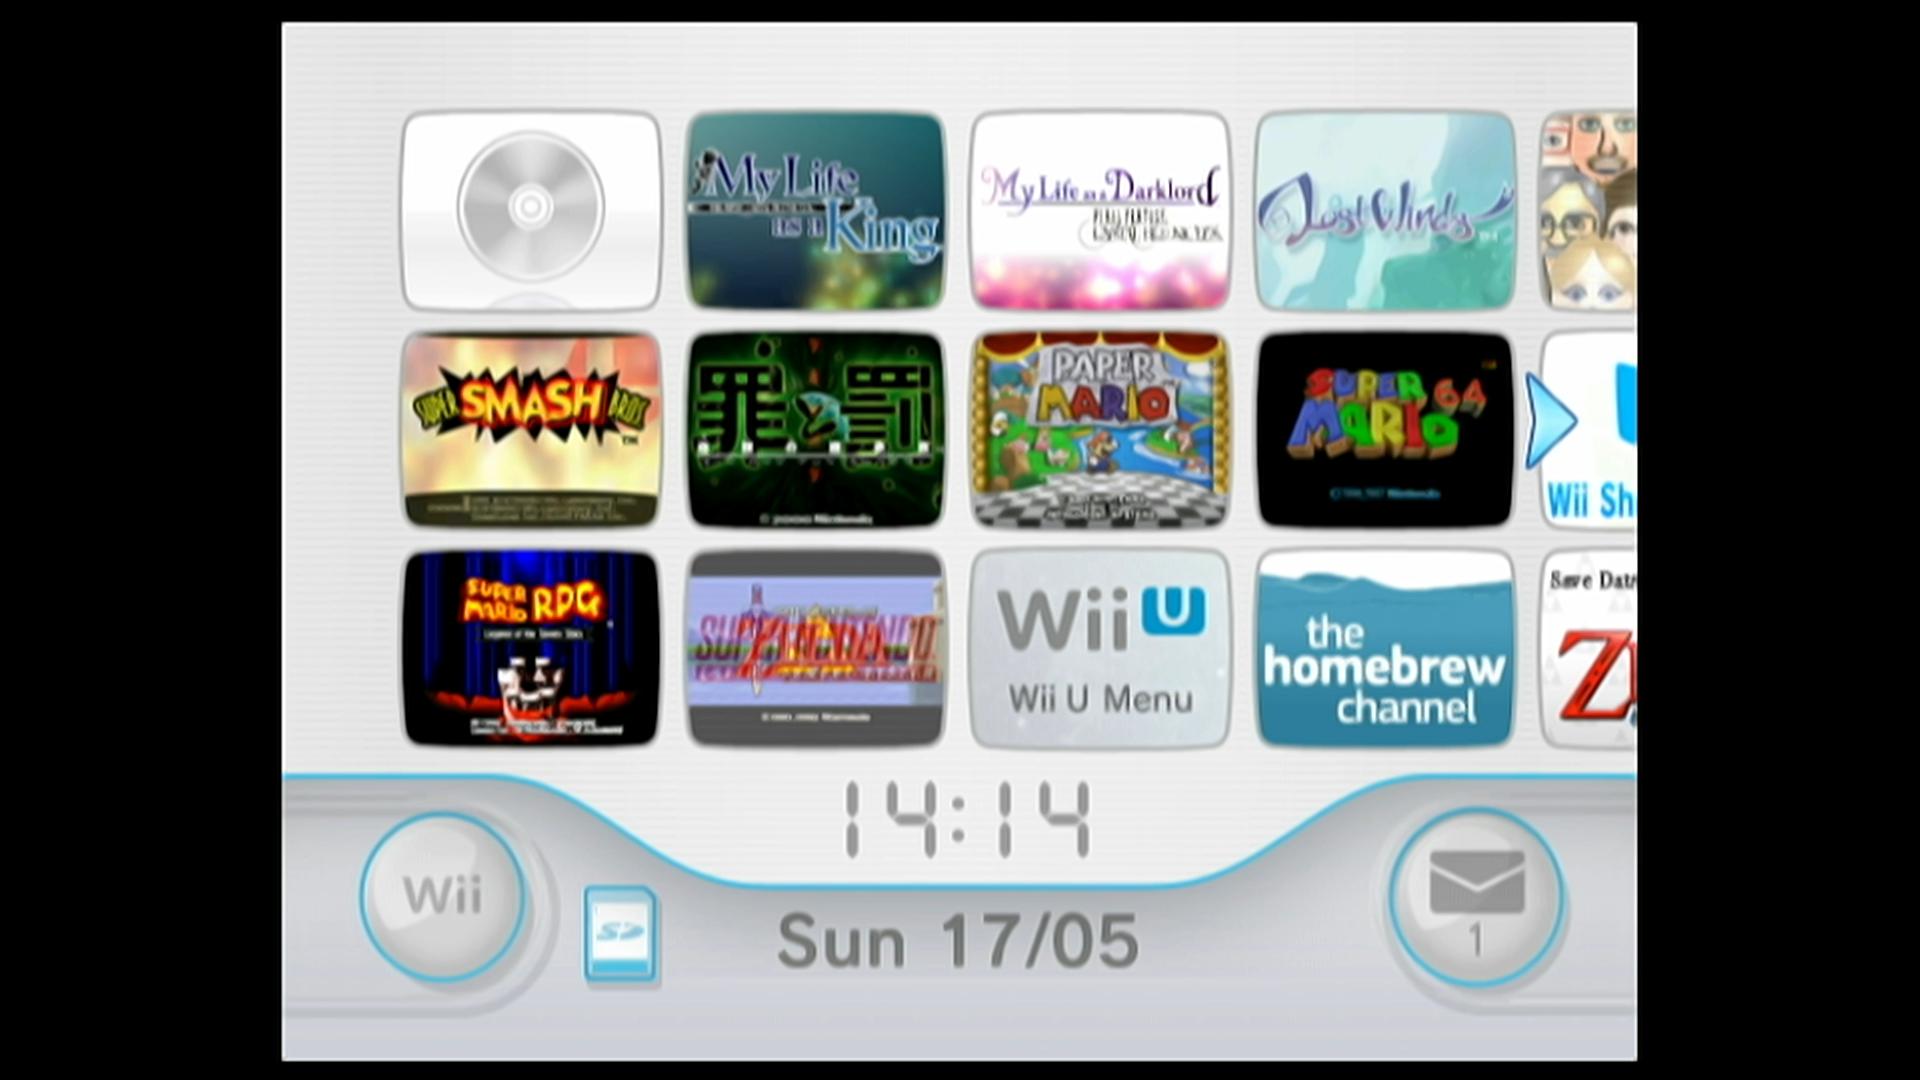 wii-menu-mclassic-480p-retro-post-screenshot-2020-05-17-13-43-40